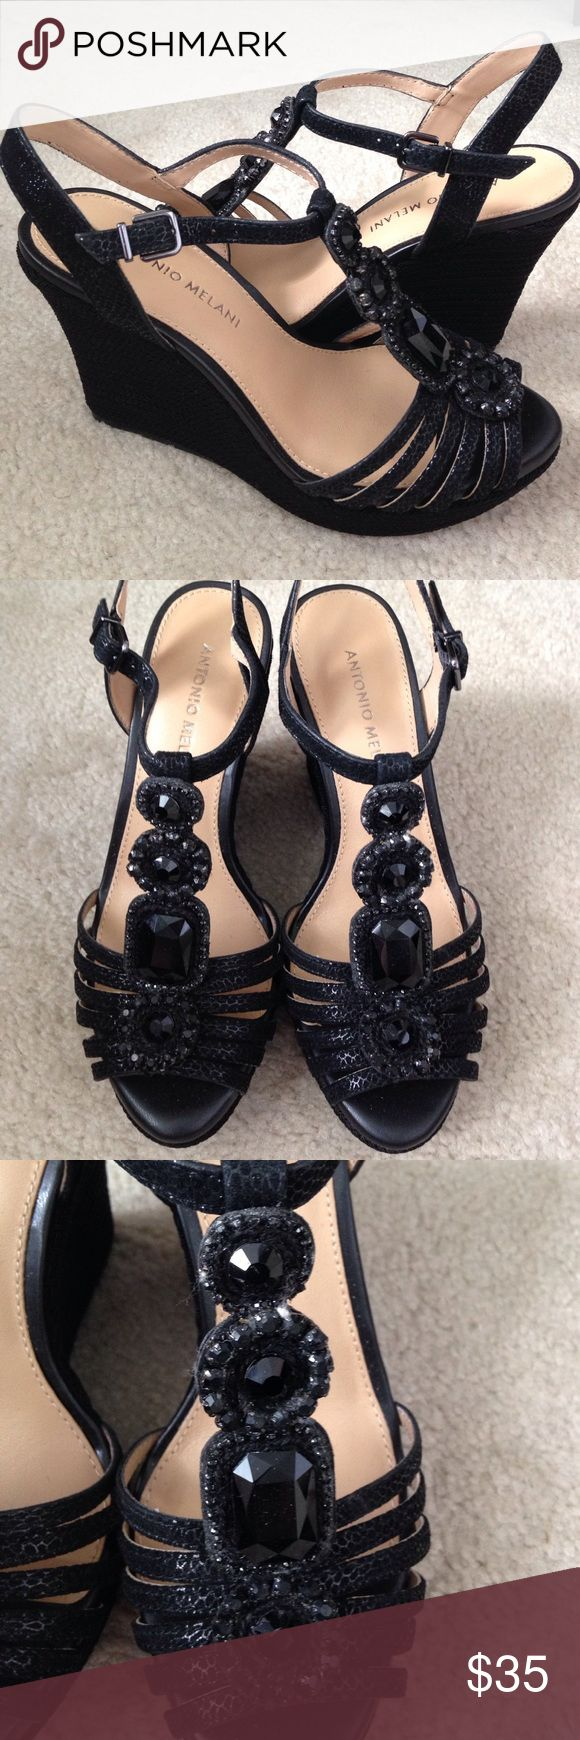 New Antonio Melani black wedge platform shoes, 6.5 New Antonio Melani black wedge platform shoes, 6.5M, perfect condition. No box, never worn. 4 inch heel, 1.5 platform ANTONIO MELANI Shoes Wedges